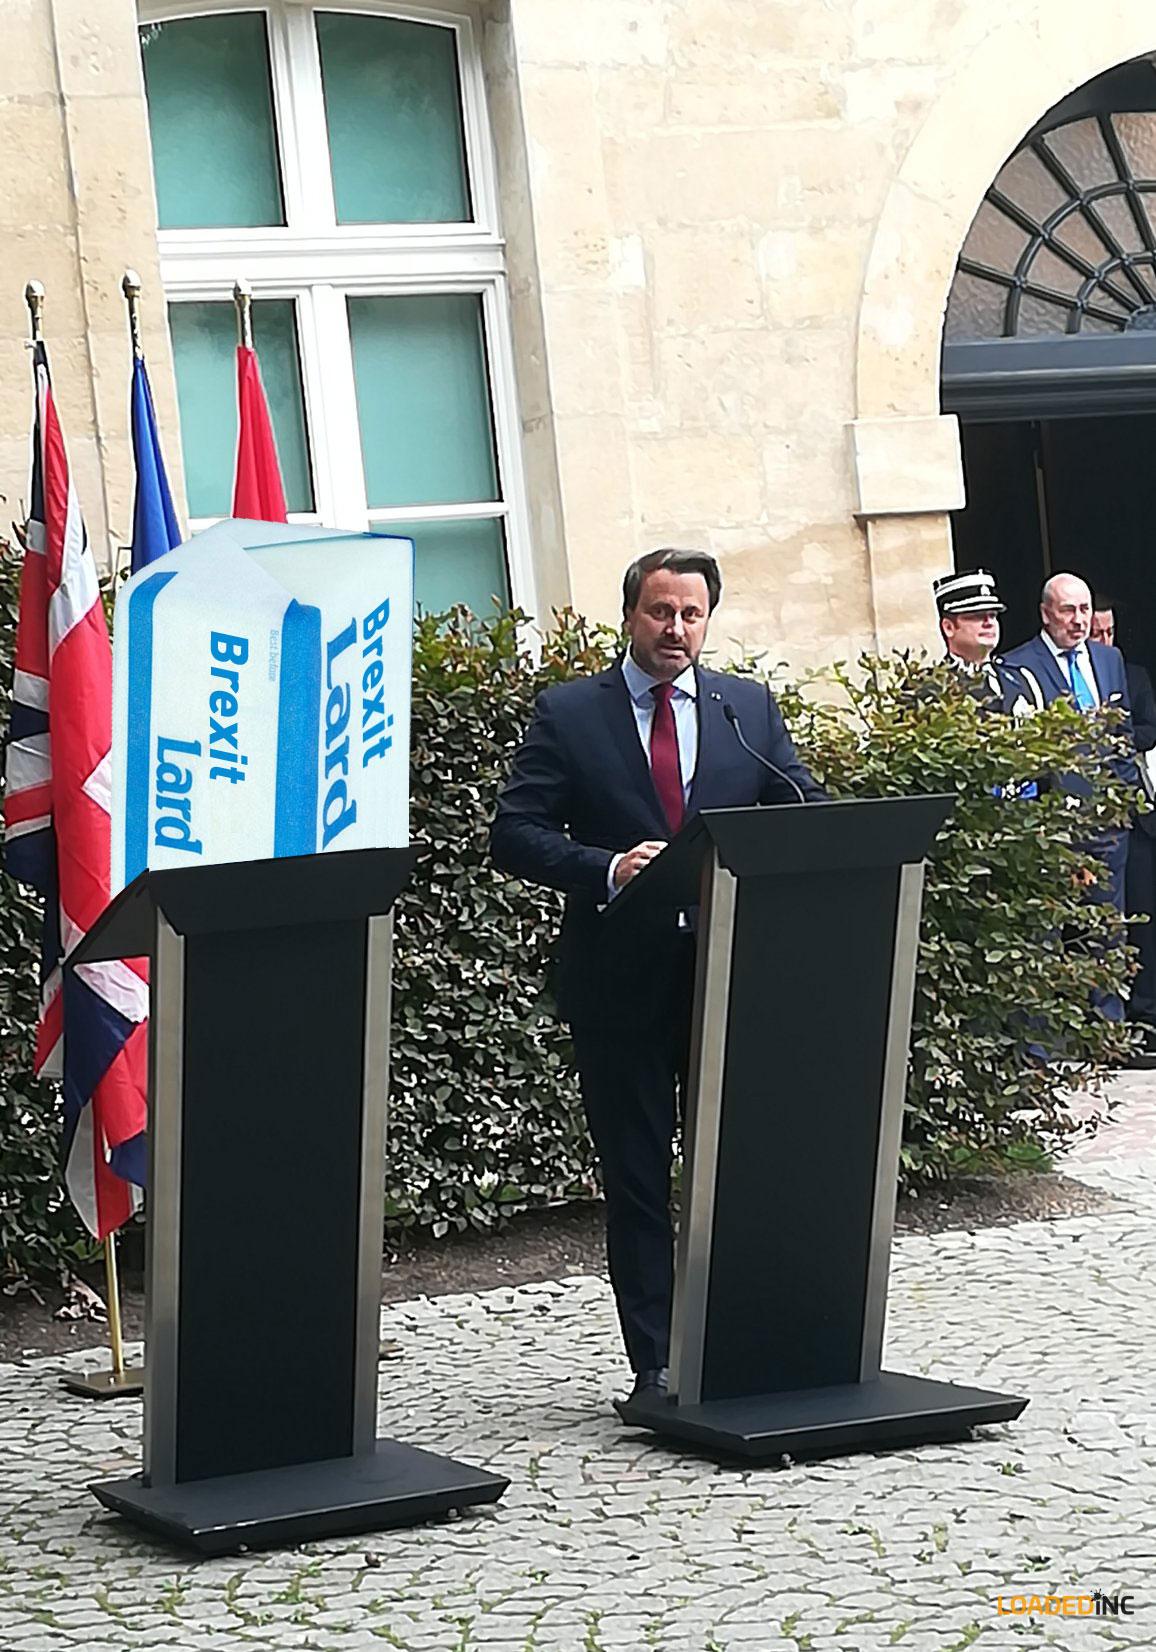 Johnson Luxembourg Brexit Lard